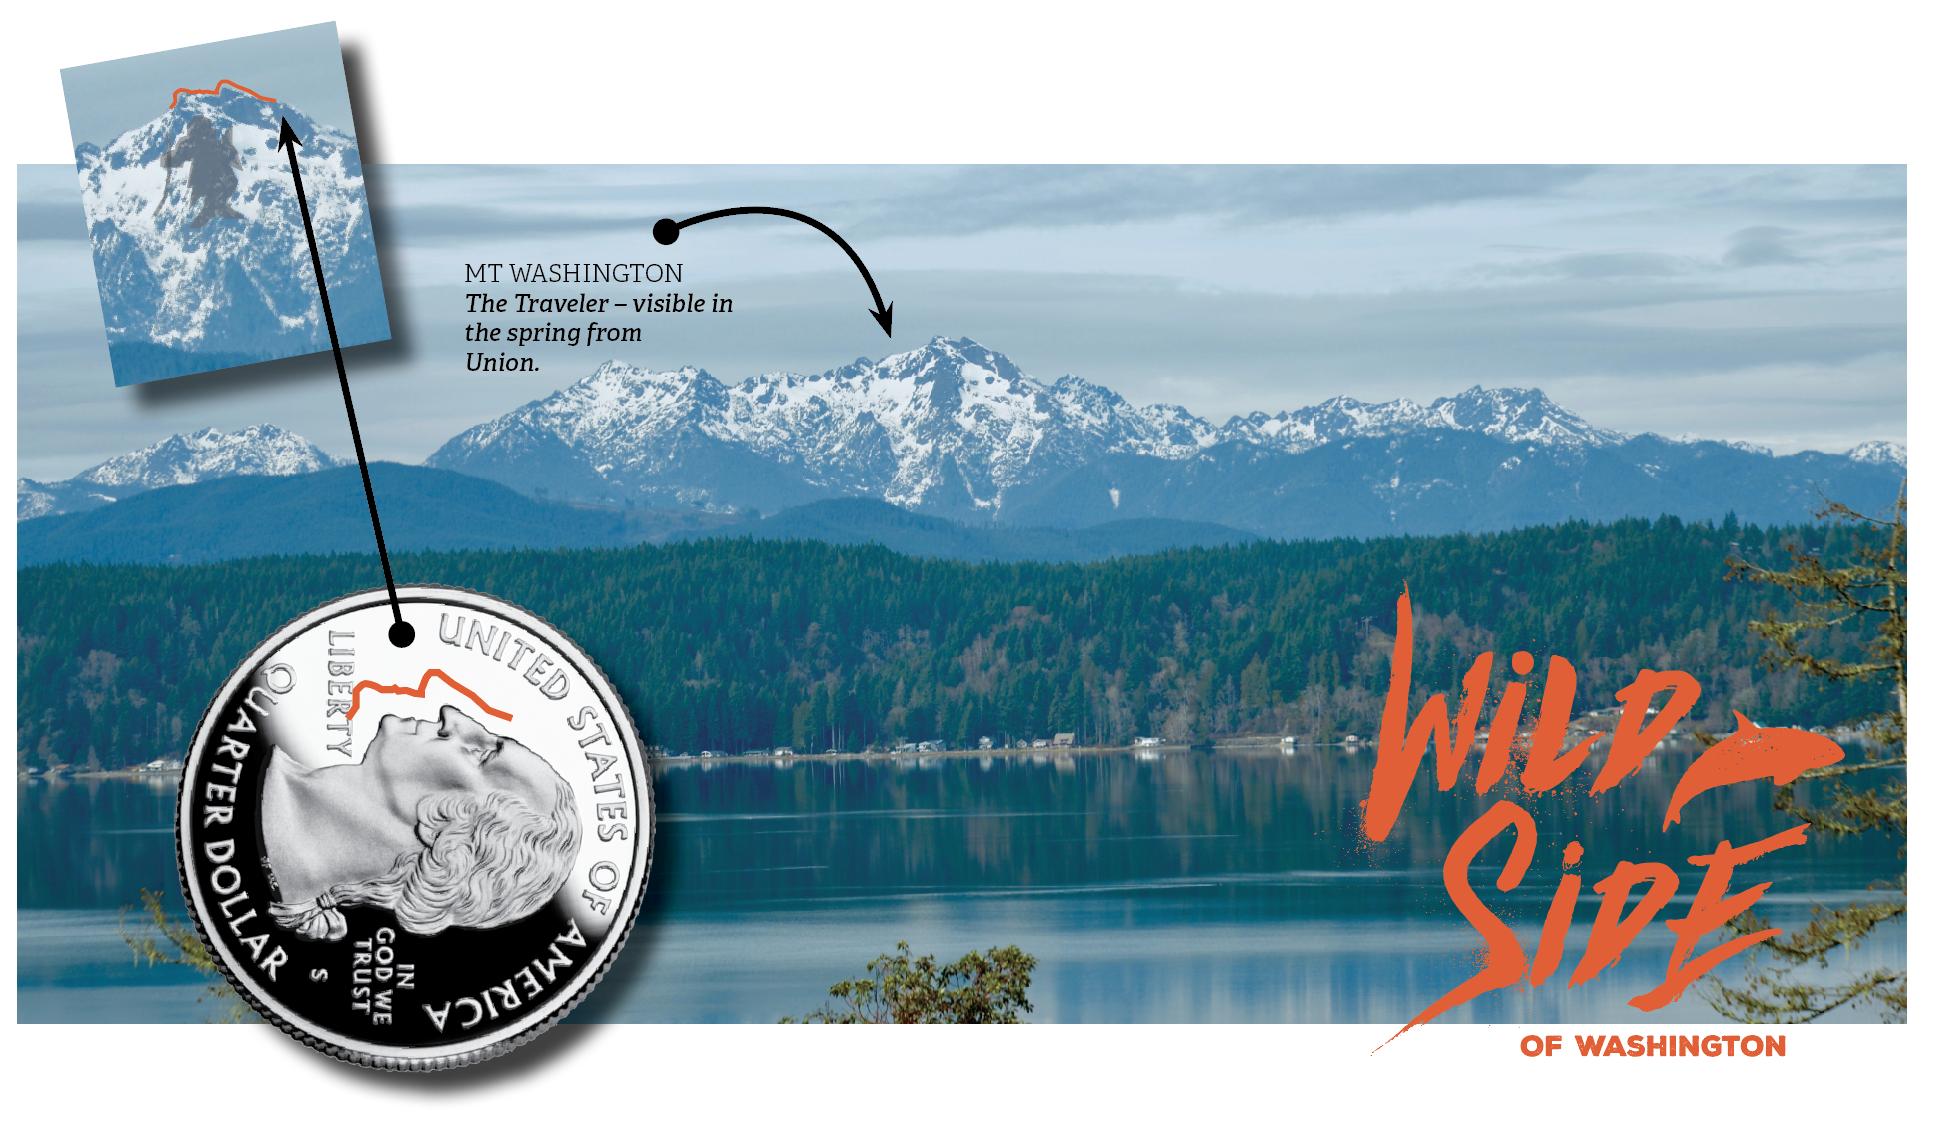 Washington's profile matches the Ridgeline of the glacier Mount Washington.